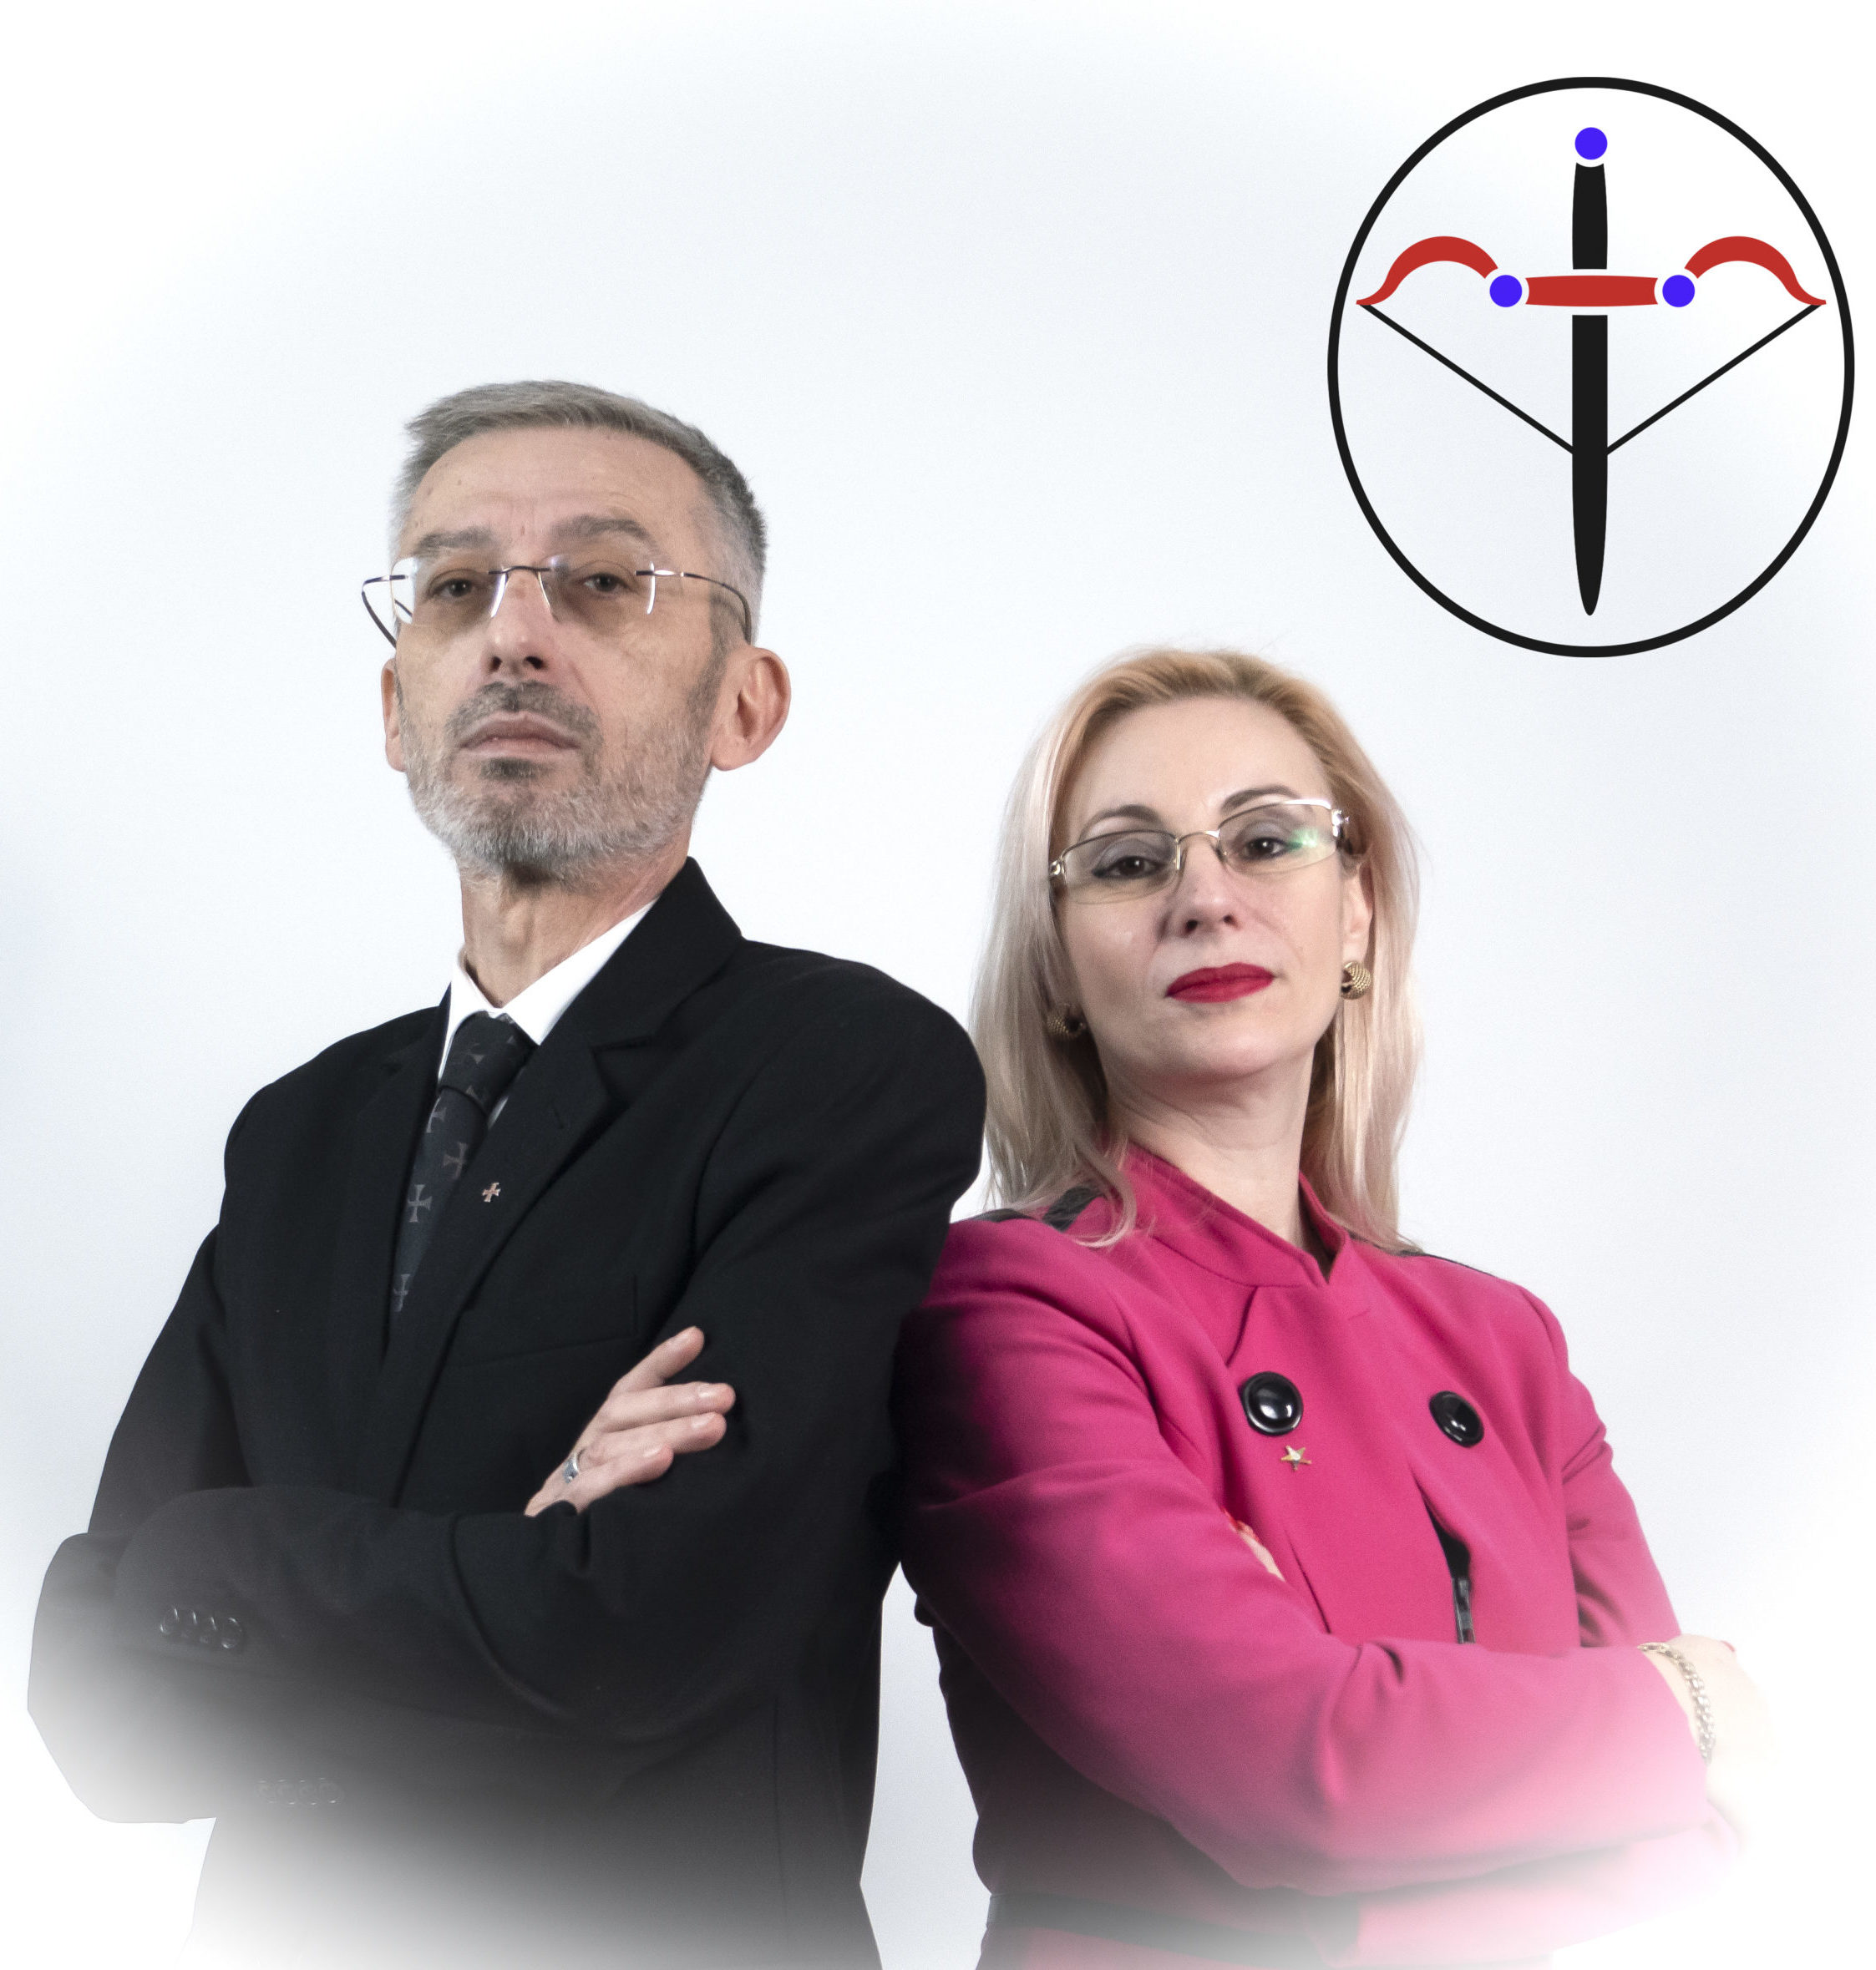 C&C Lawyers